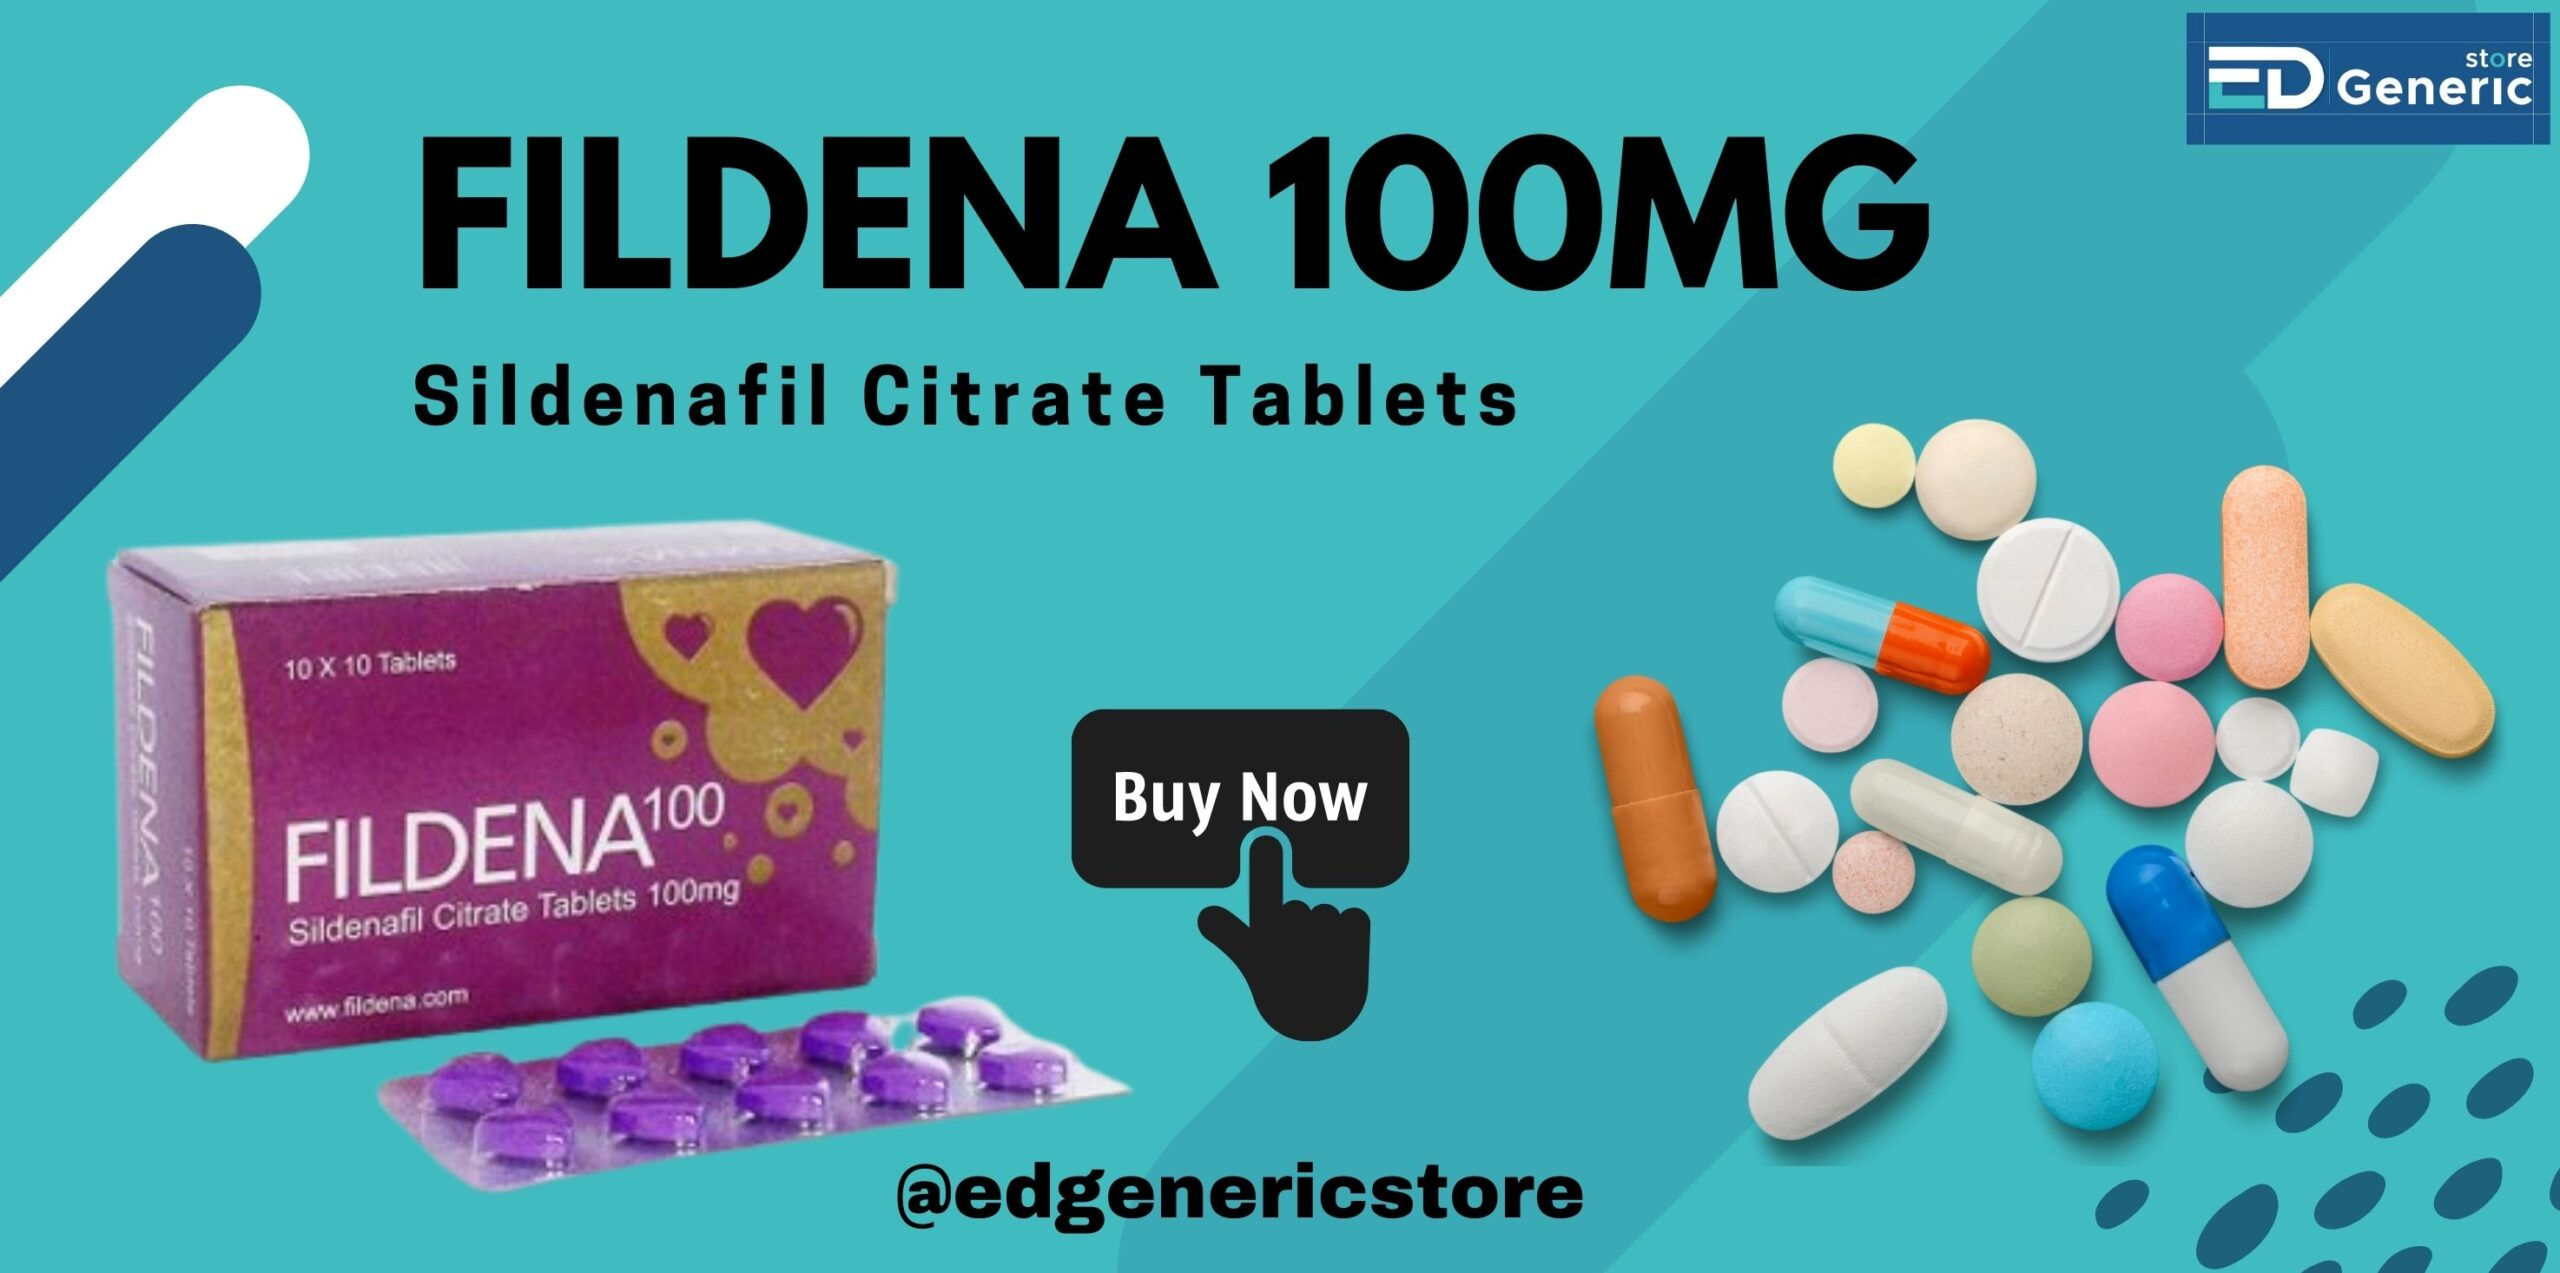 Buy Fildena 100mg online | Ed Generic Store